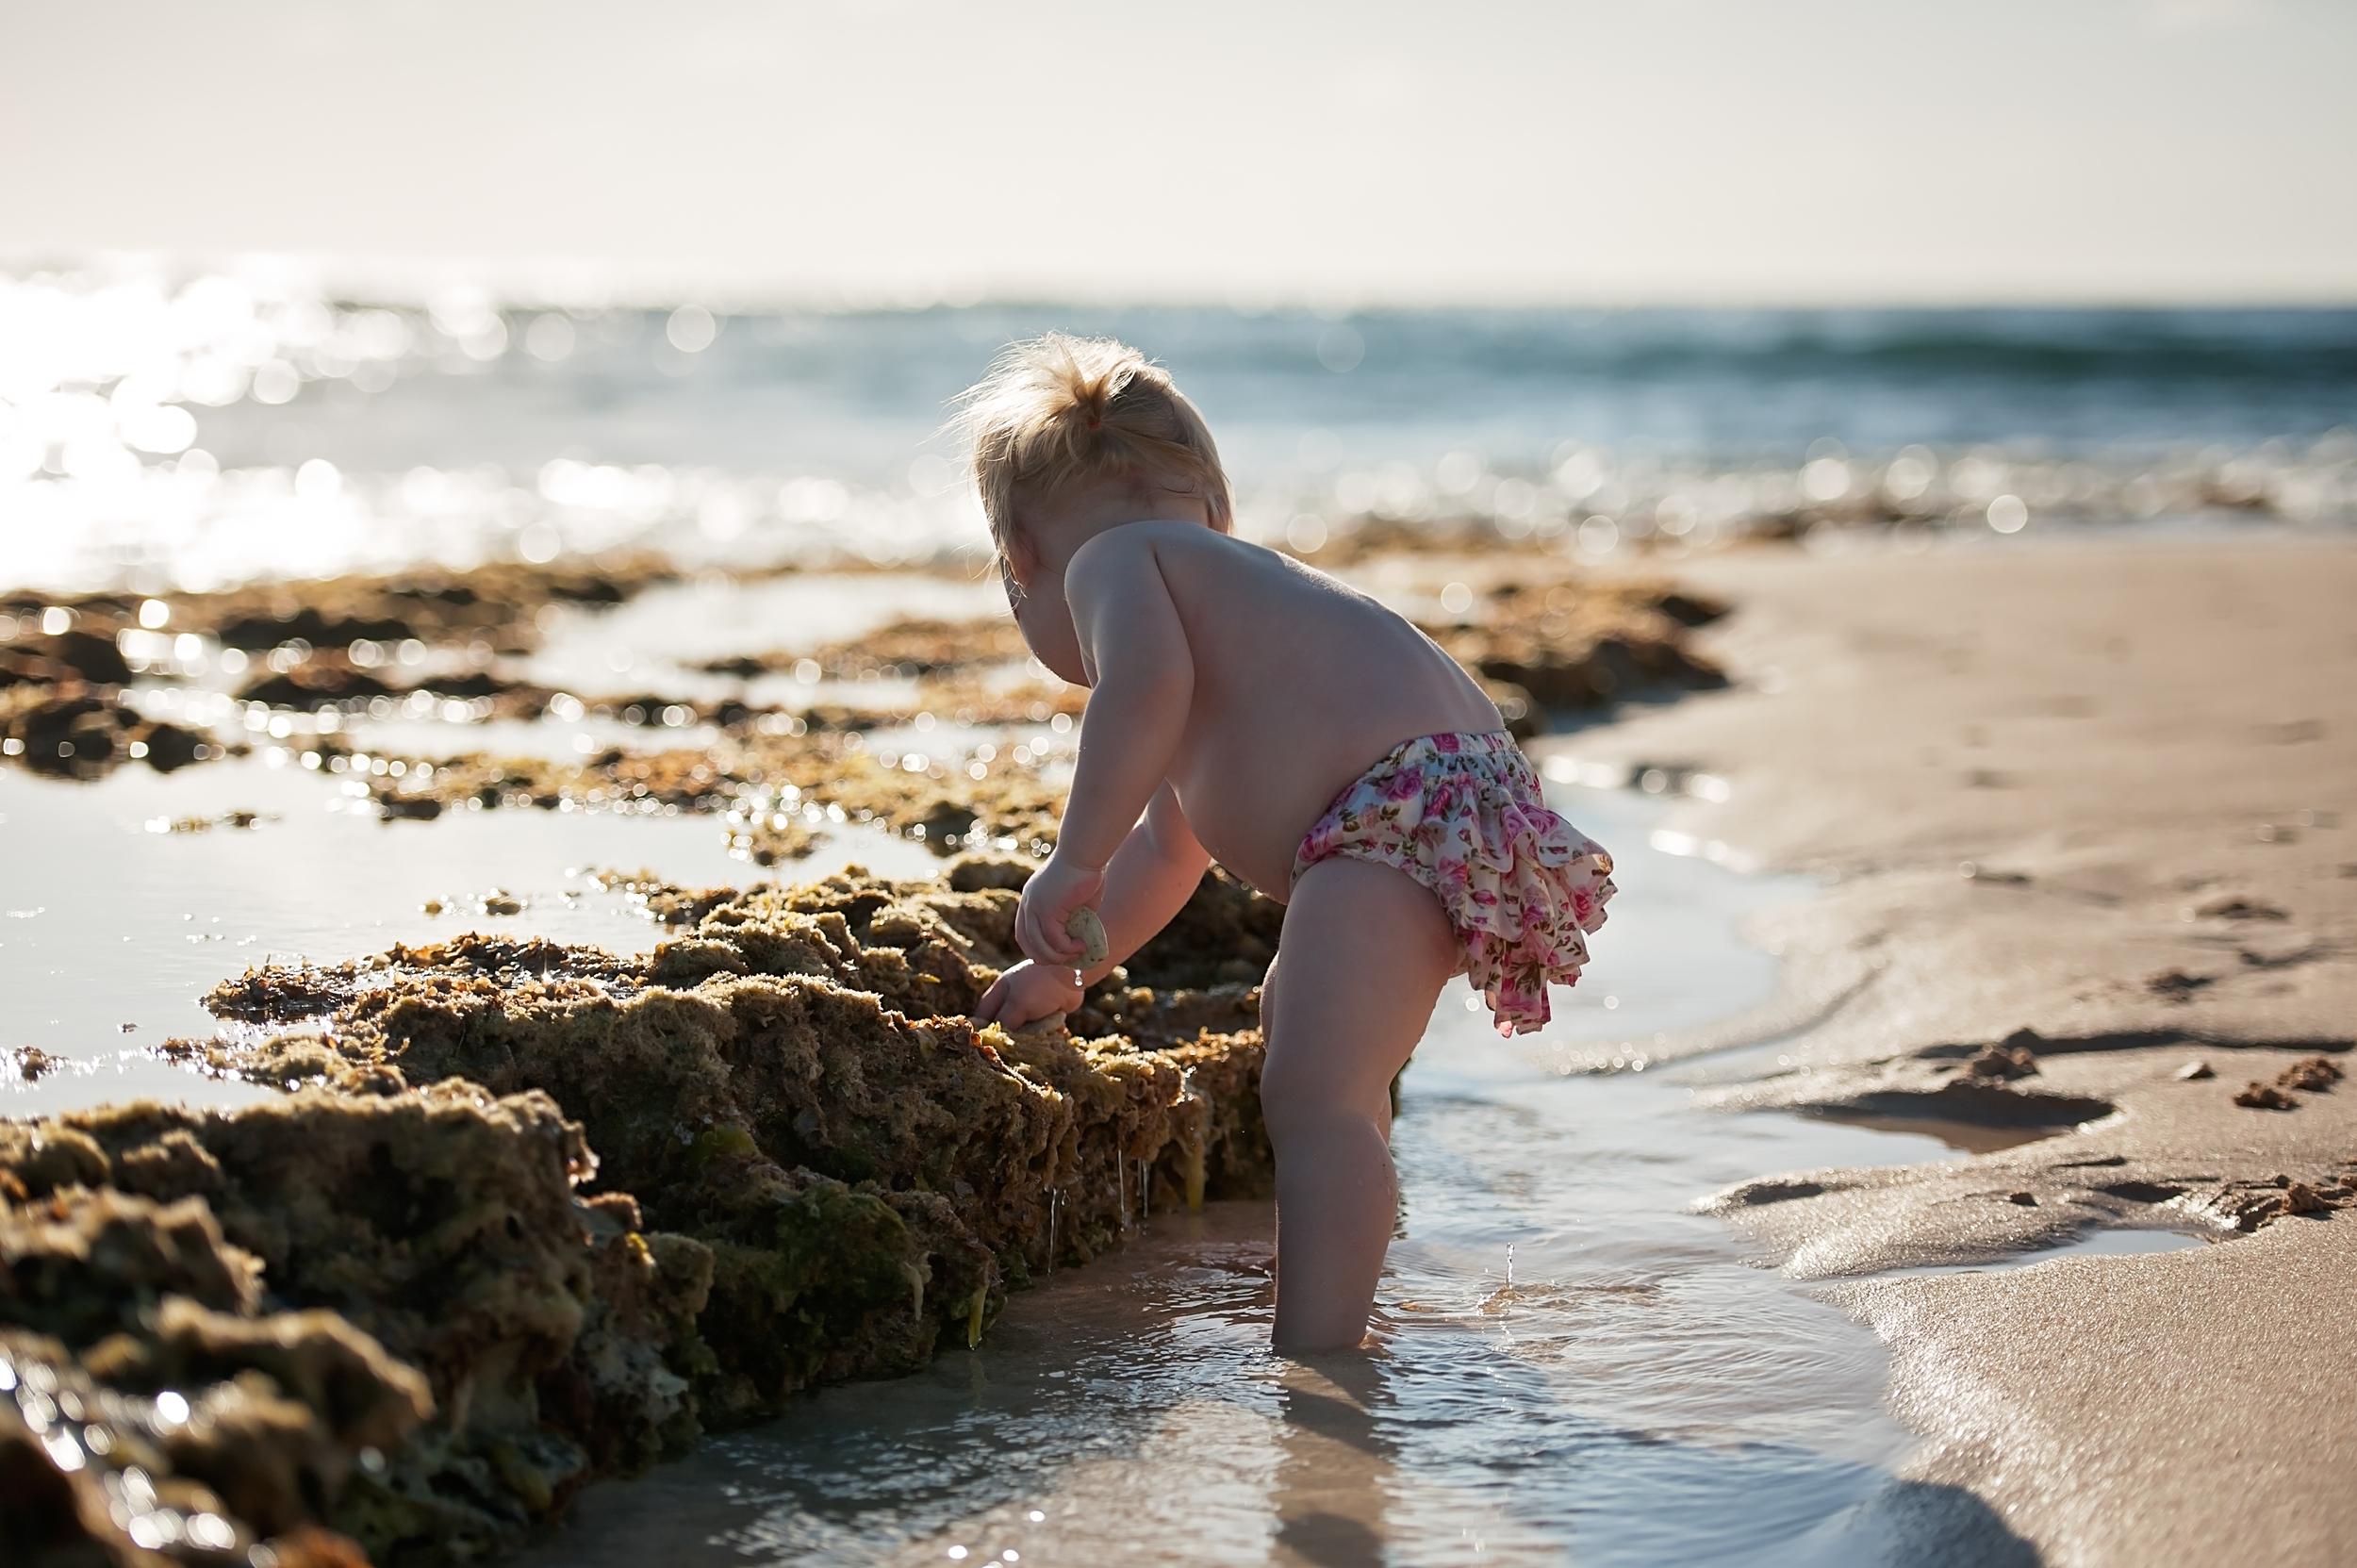 Cayman Islands family portrait photography | on the beach